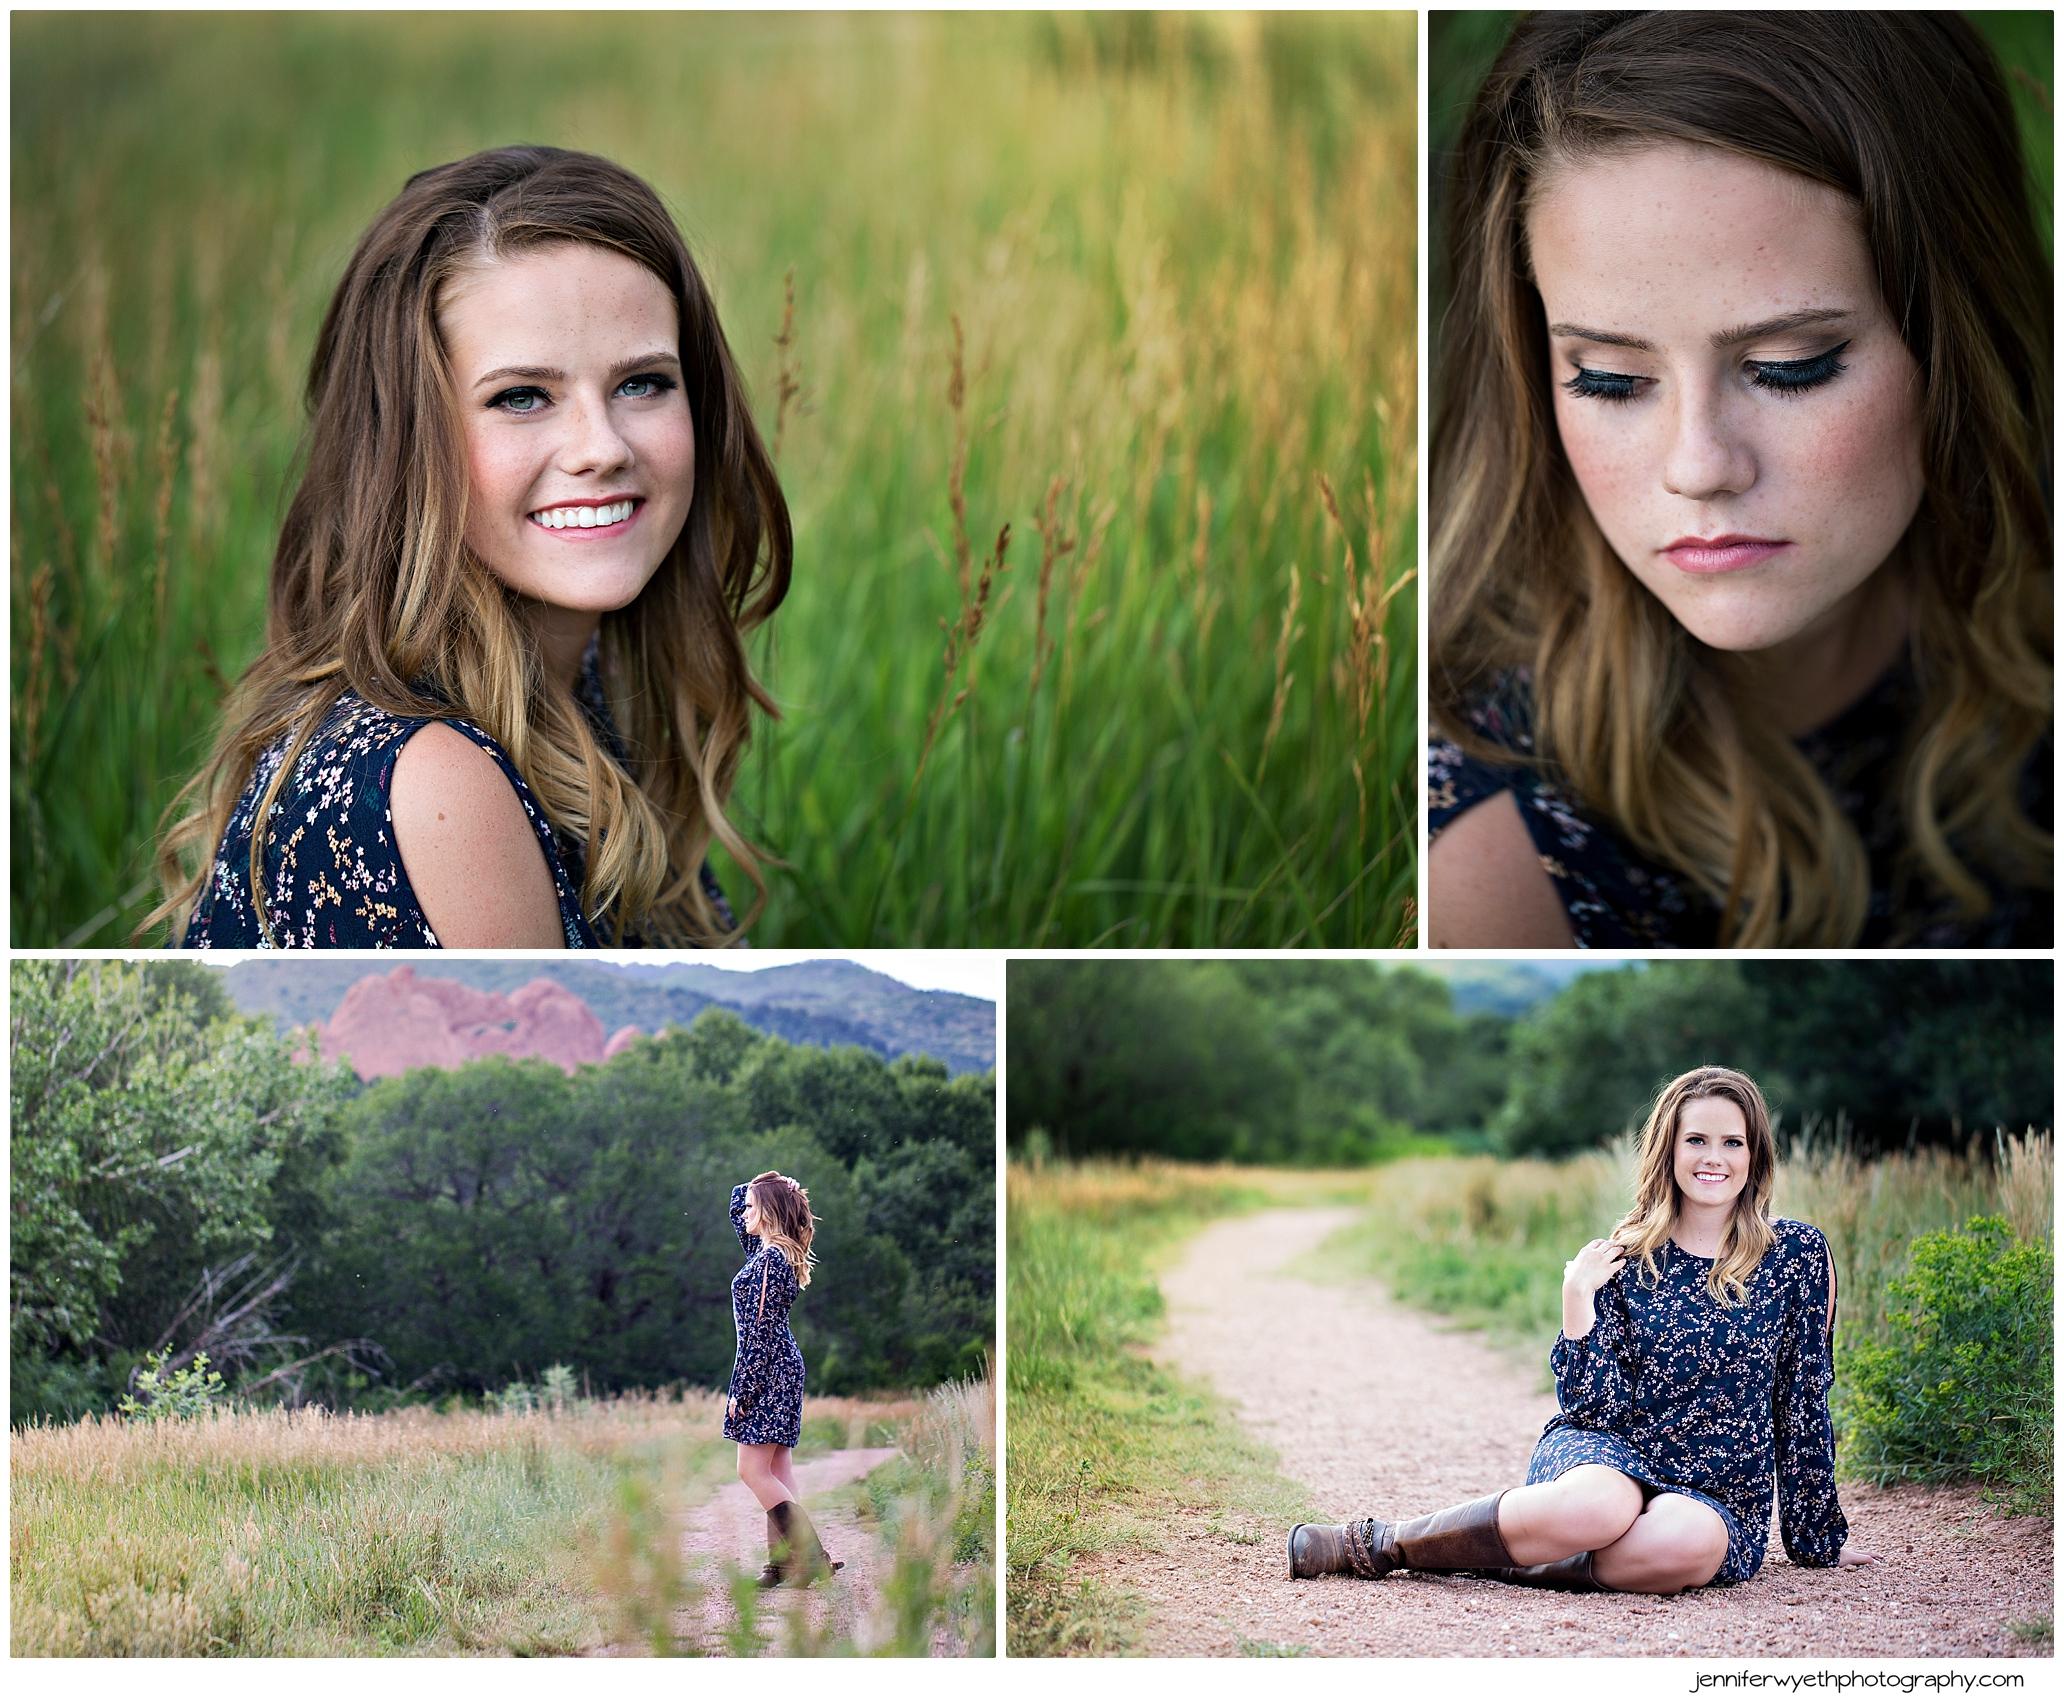 Jennifer-Wyeth-photography-senior-pictures-colorado-springs-photographer_0166.jpg